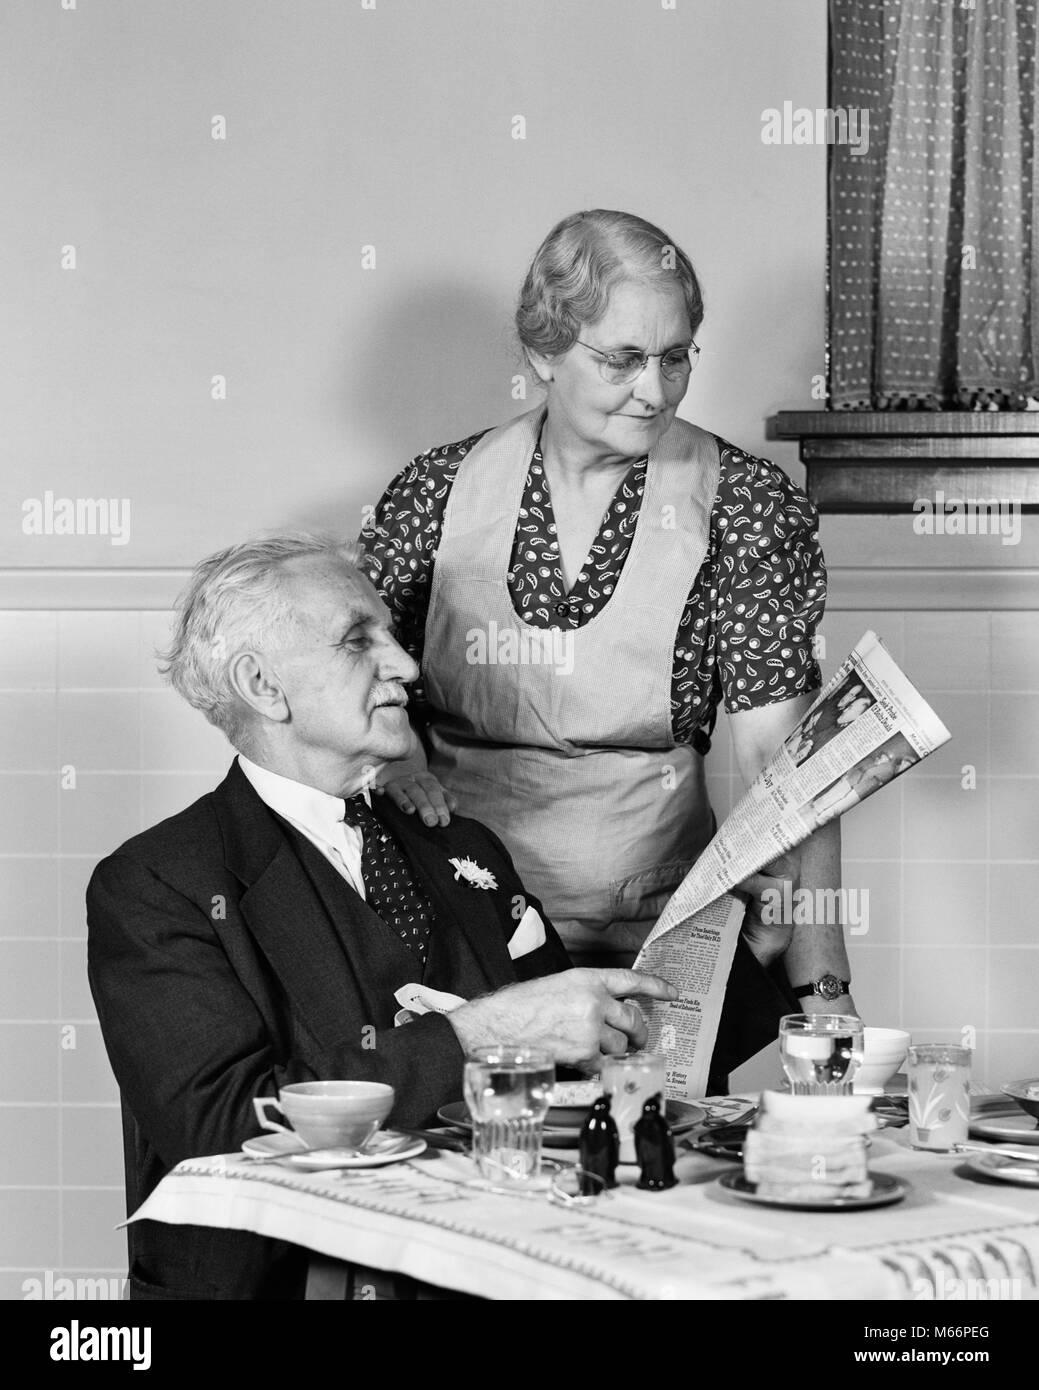 Älteres Paar mit altem Mann